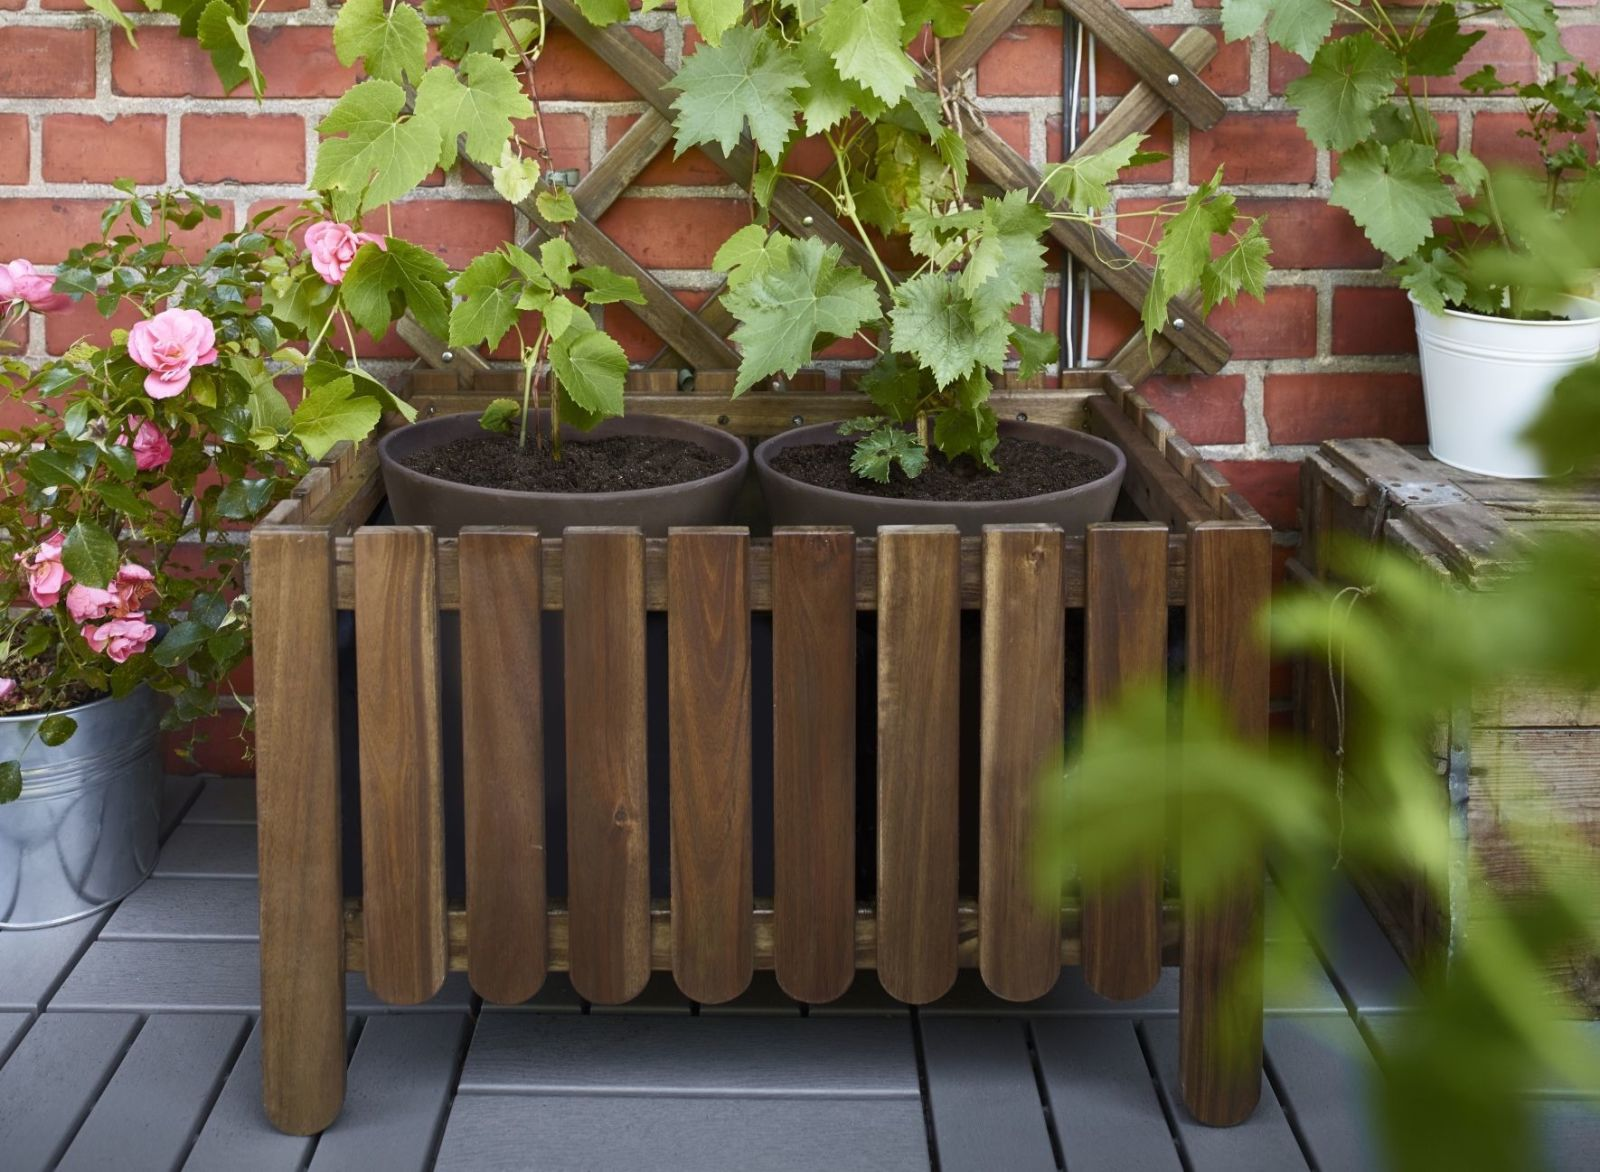 Making of a garden trough